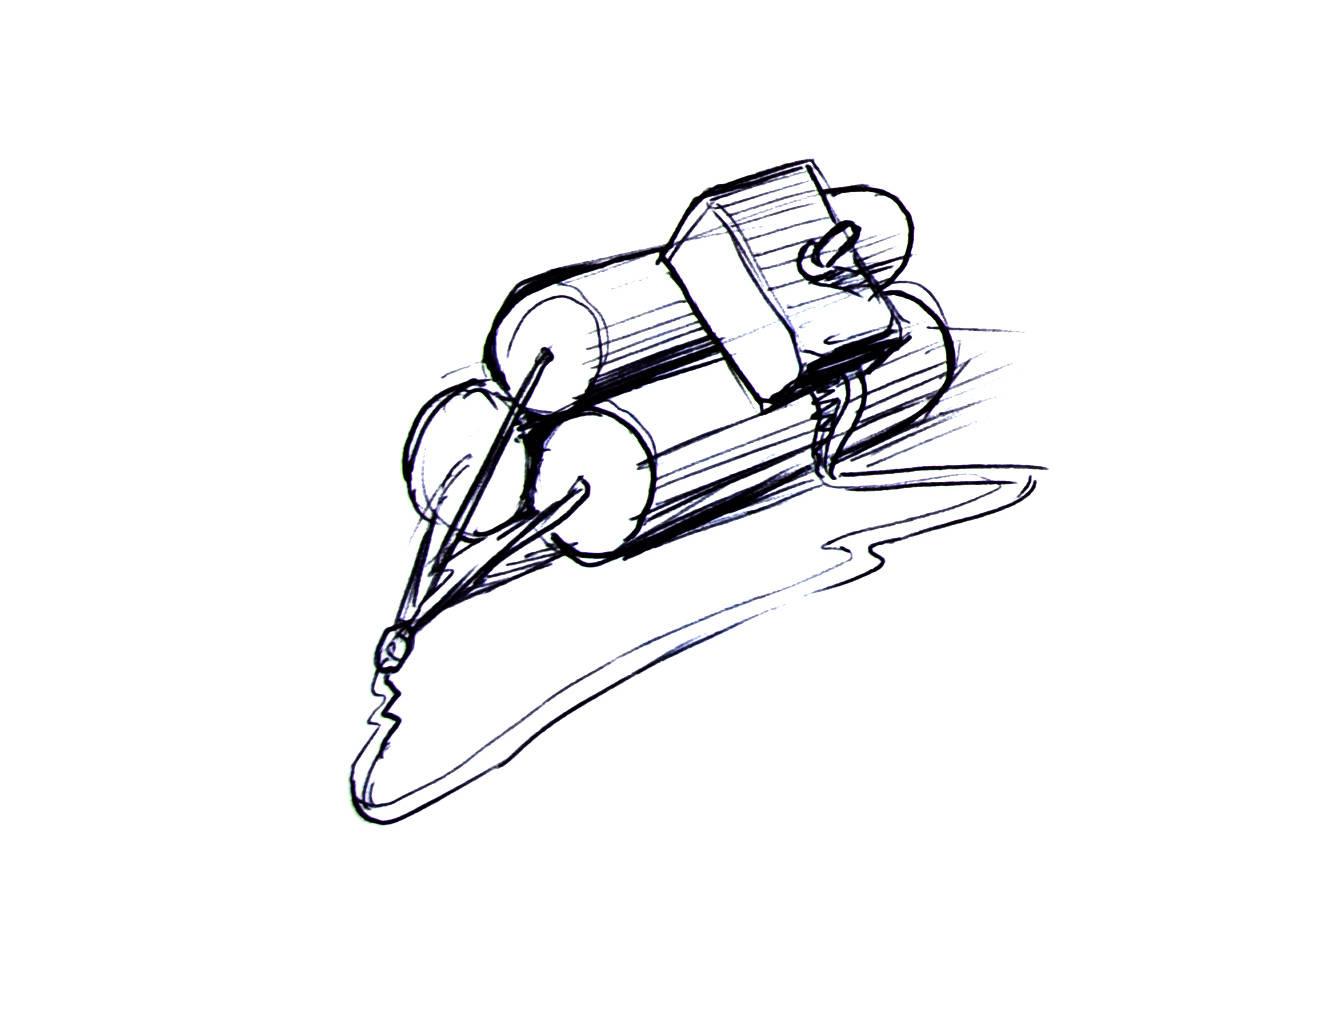 Dymke scribble lvz07 0028 ebene 5